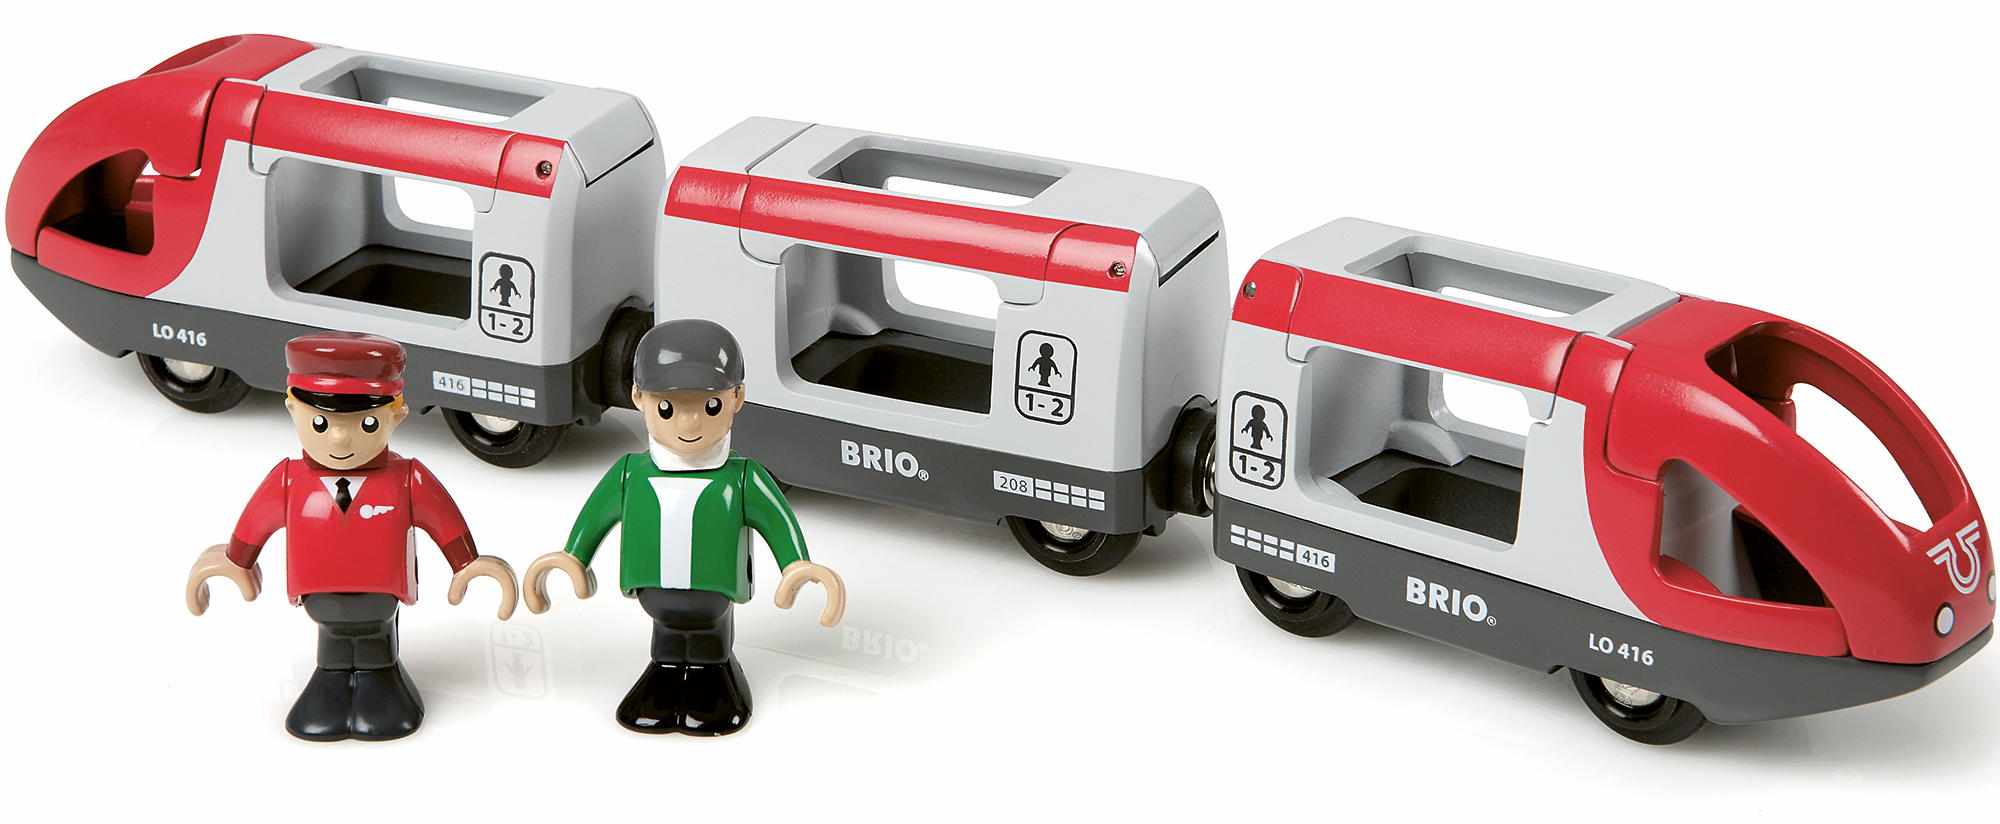 brio travel train baby toddler child wooden carraiges people toy train bn ebay. Black Bedroom Furniture Sets. Home Design Ideas